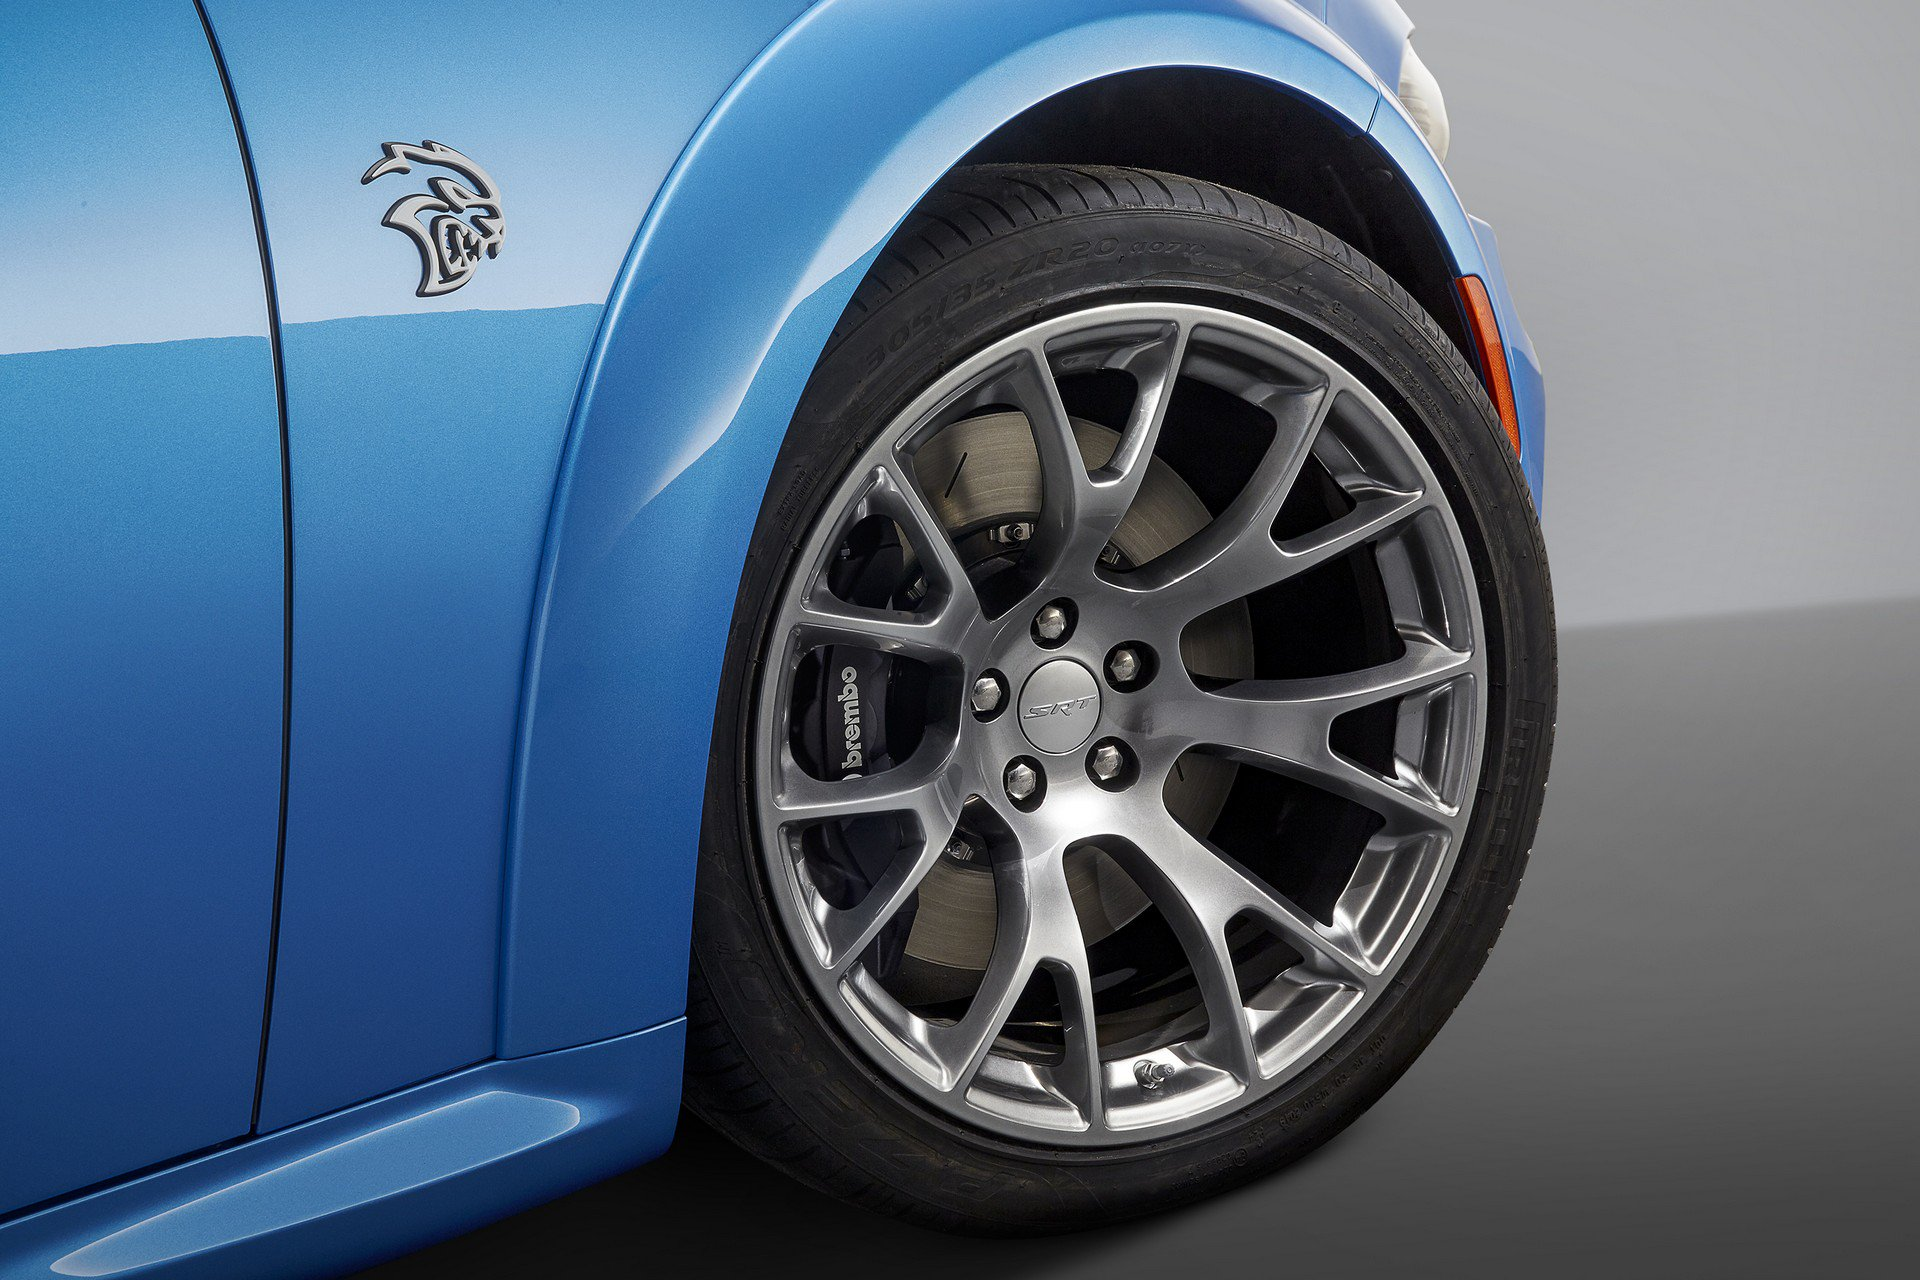 Dodge-Charger-SRT-Hellcat-Widebody-Daytona-50th-Anniversary-Edition-3